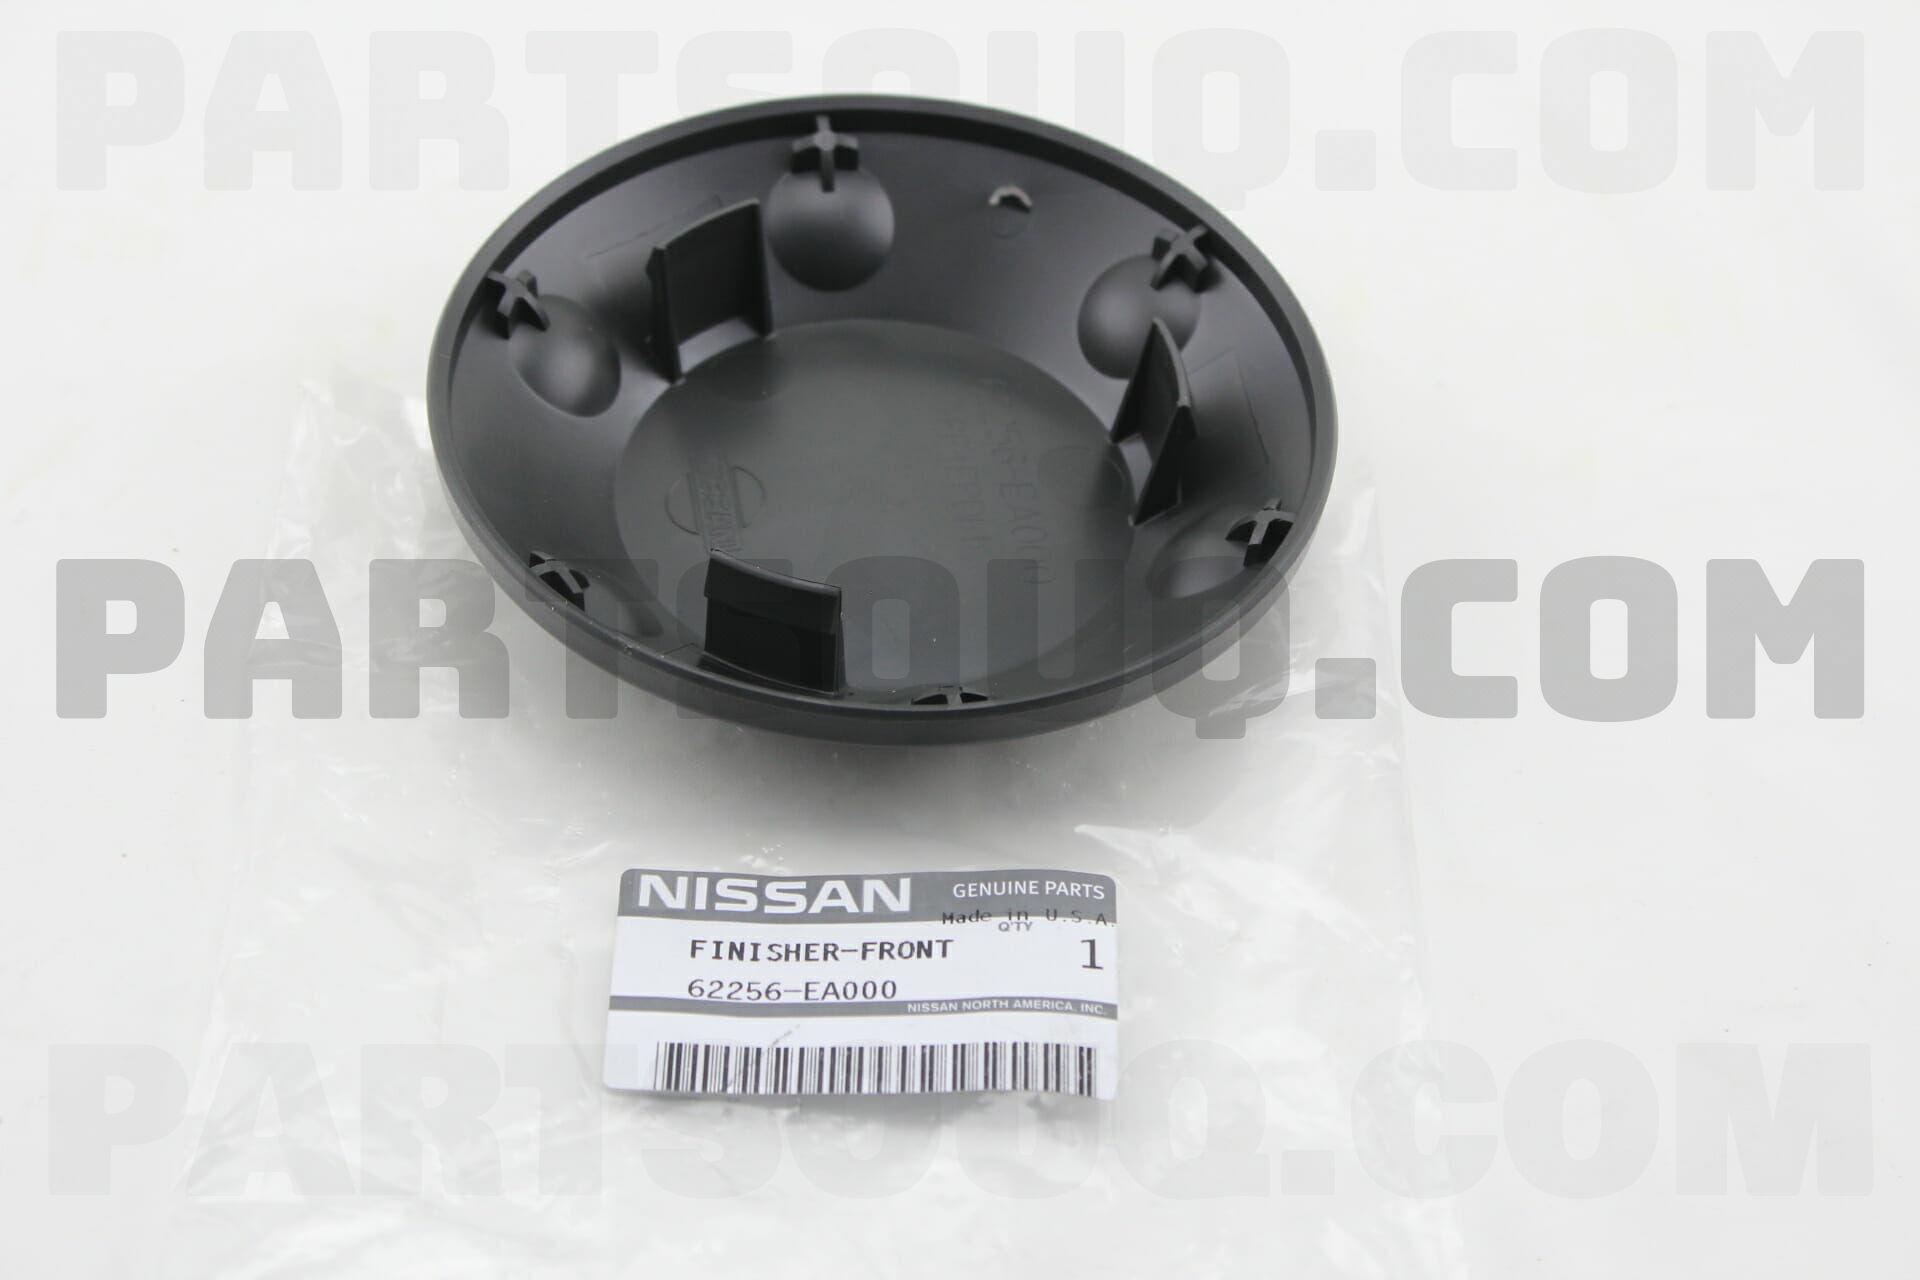 Genuine Nissan 62256-EA000 Bumper Finisher